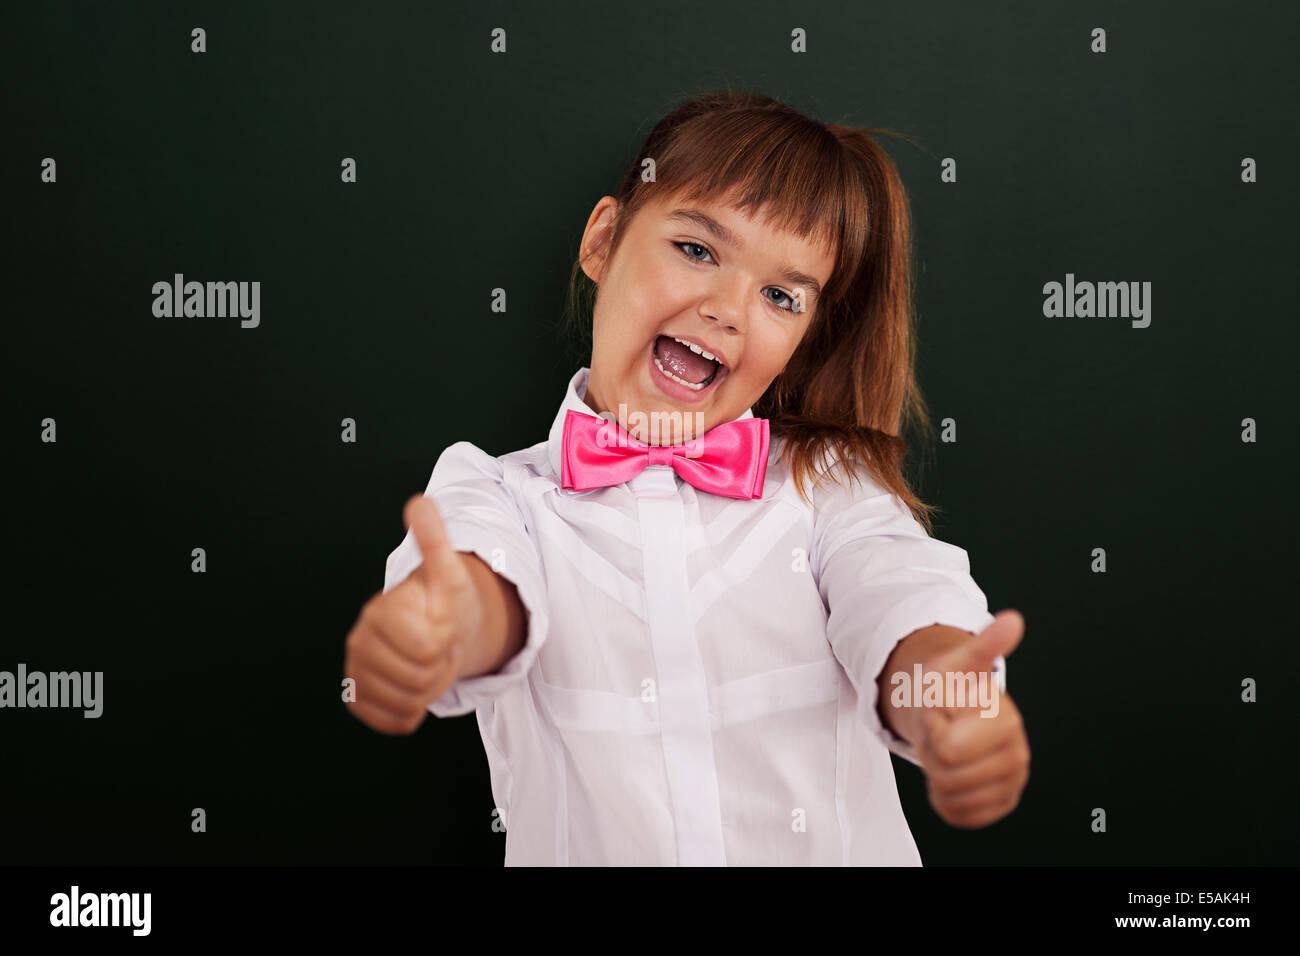 Niña alegre mostrando pulgar arriba, Debica, Polonia Imagen De Stock